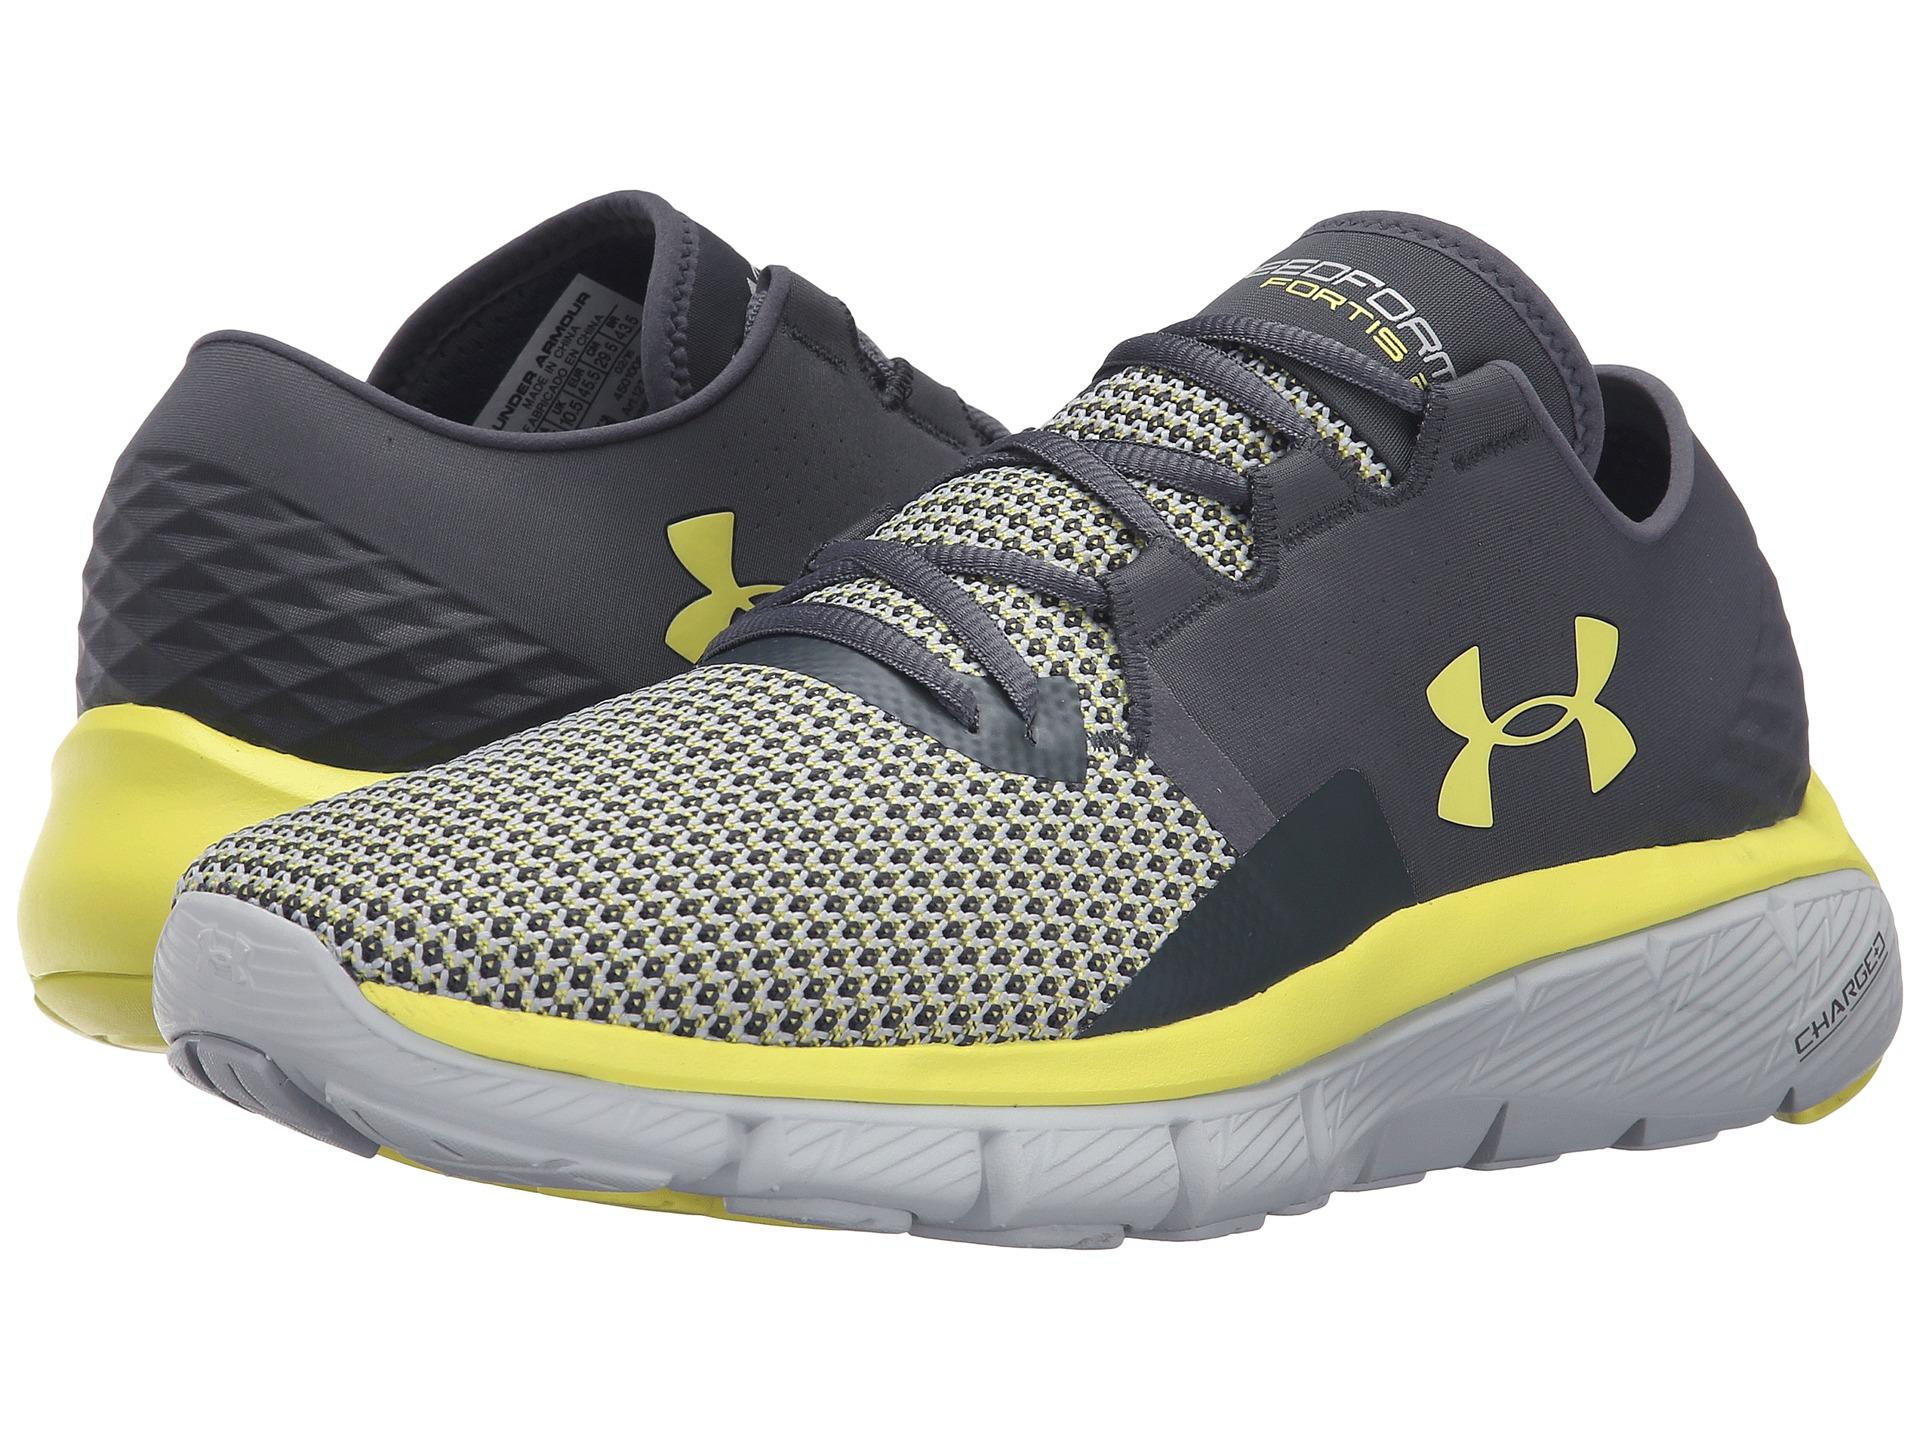 Under Armour Men S Speedform Fortis  Running Shoes Stealth